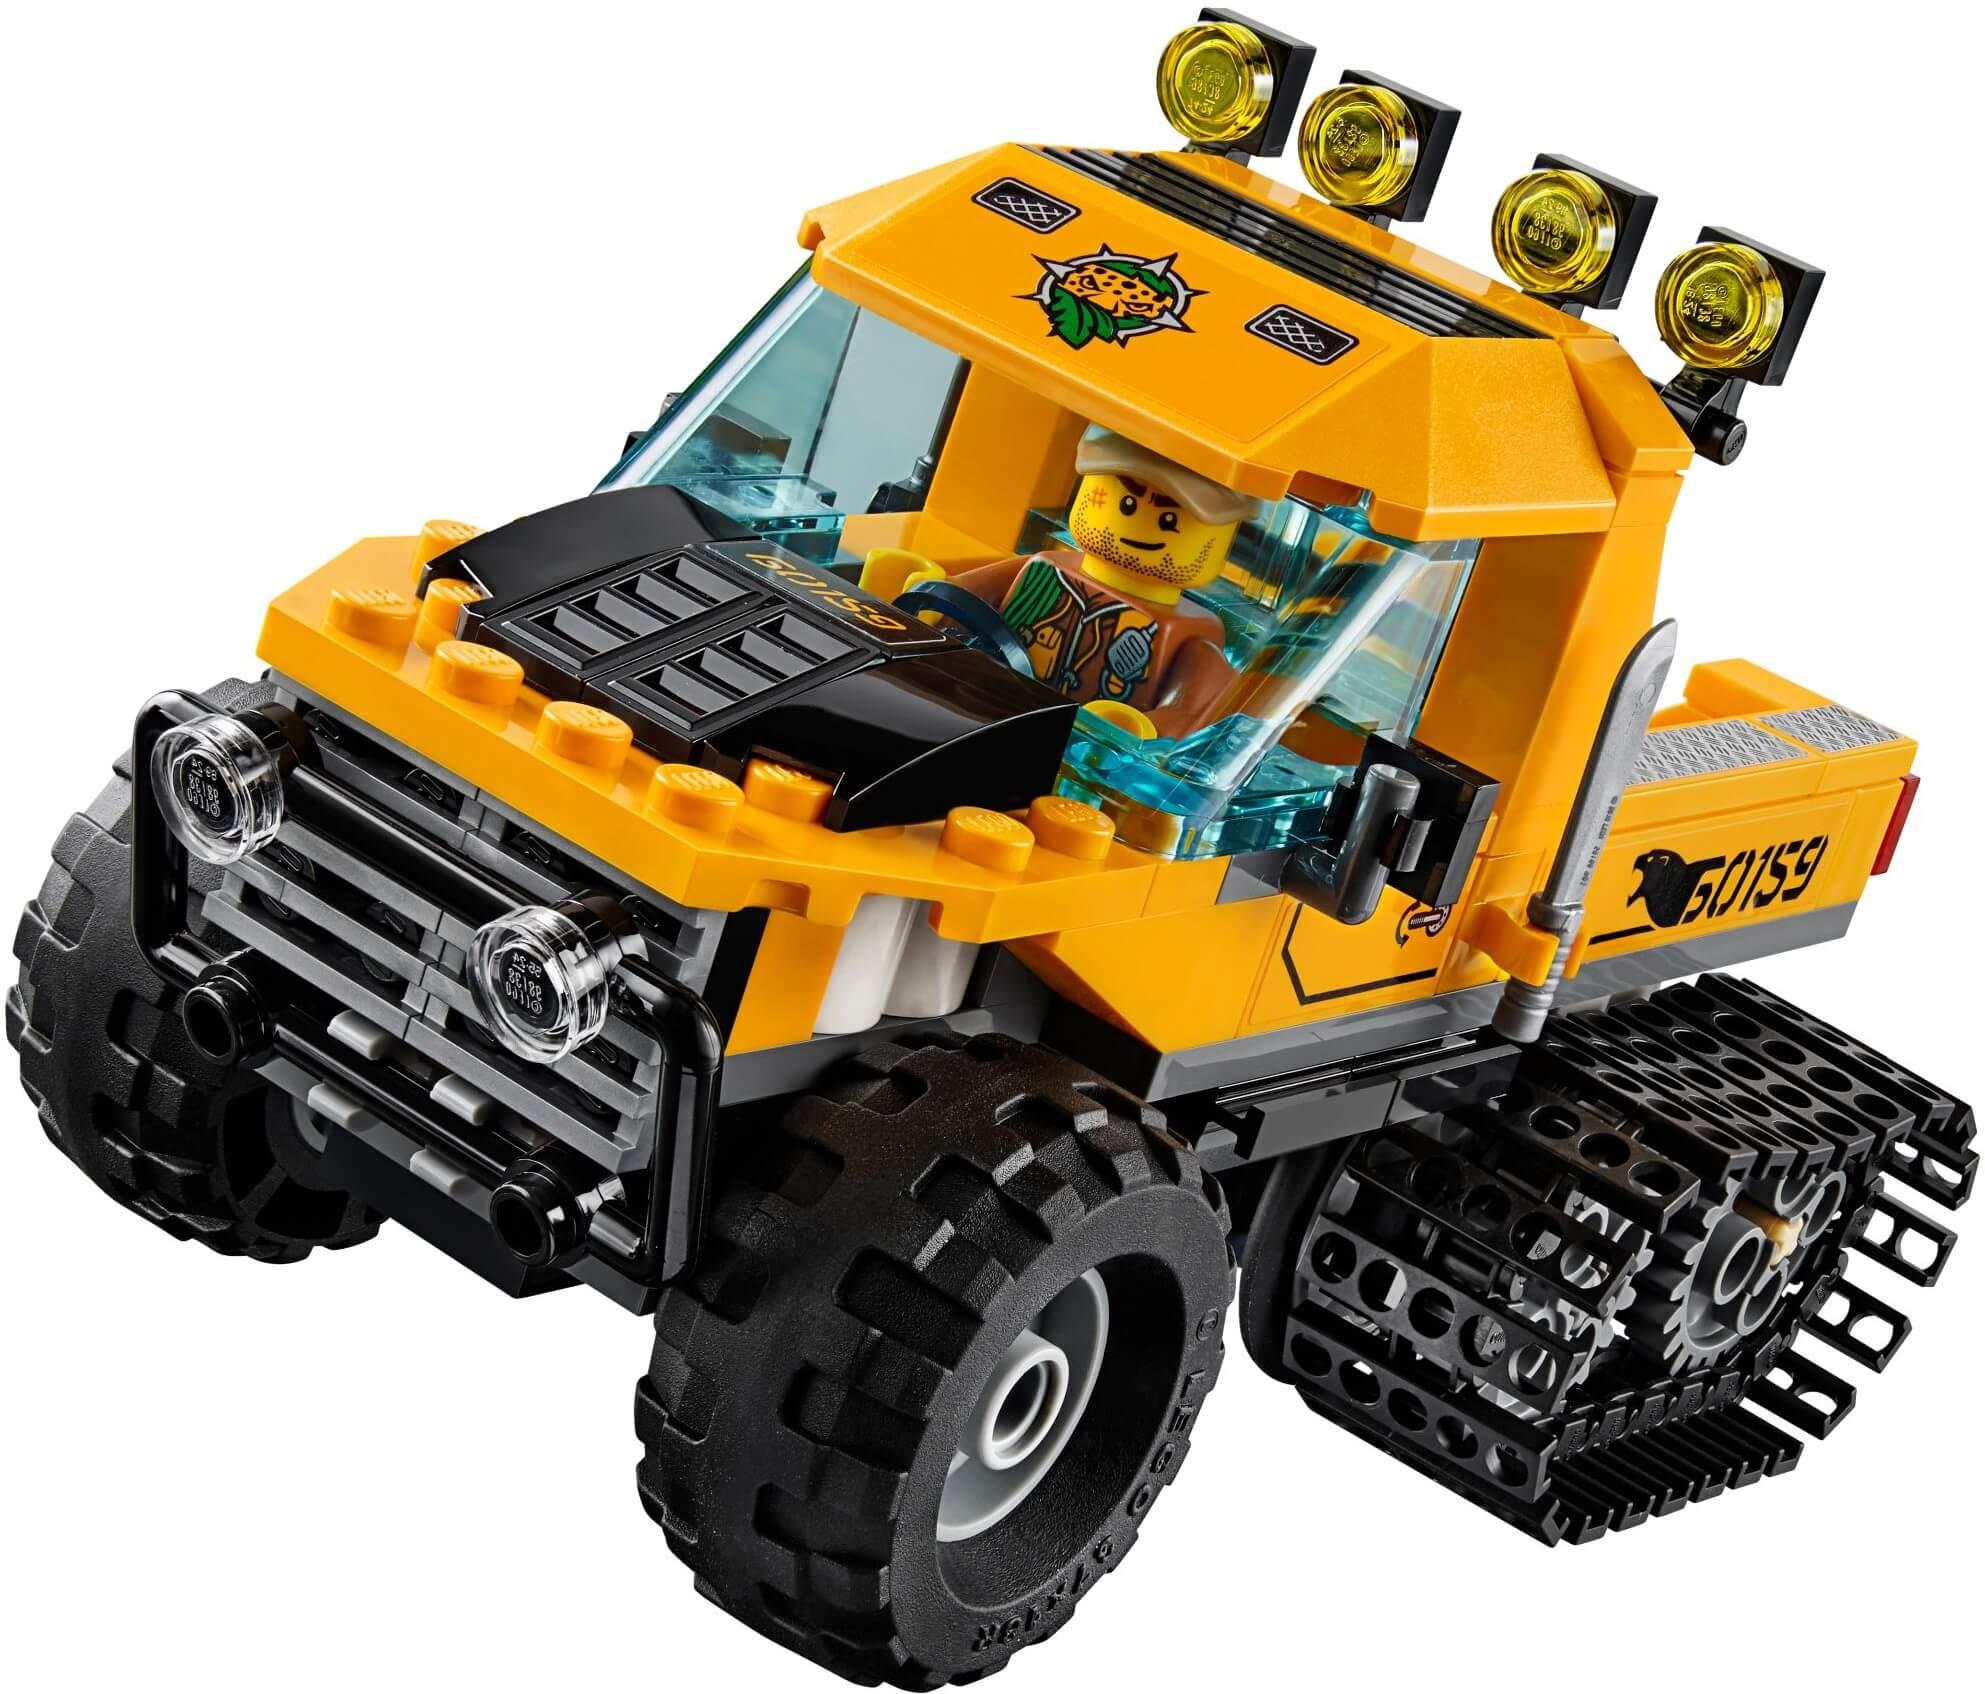 Mua đồ chơi LEGO 60159 - LEGO City 60159 - Xe Tải Bánh Xích vượt Rừng (LEGO City Jungle Explorers Jungle Halftrack Mission)